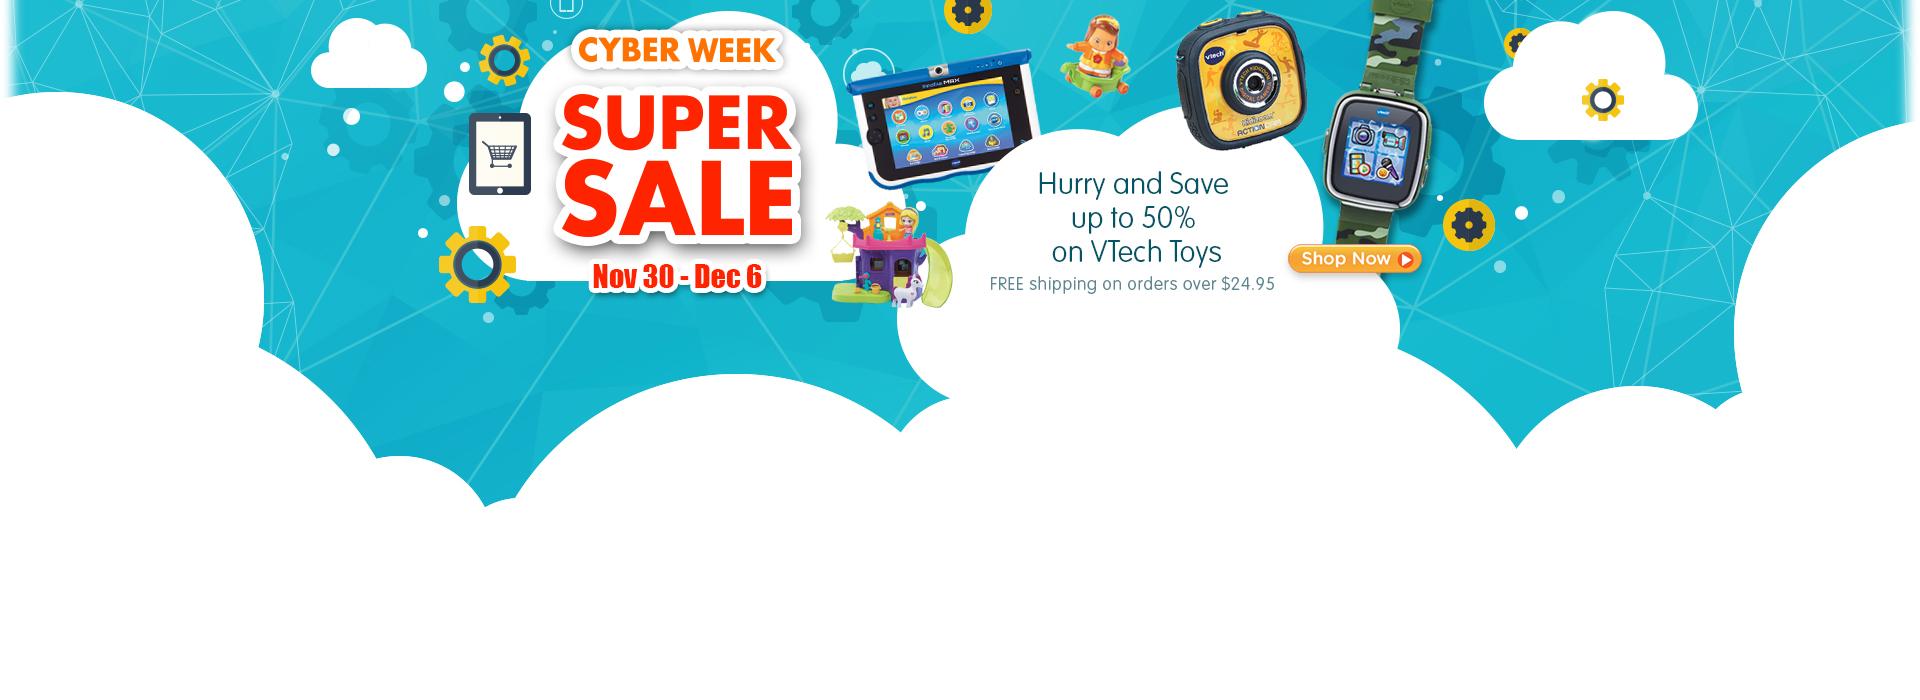 Cyber Week Super Sale